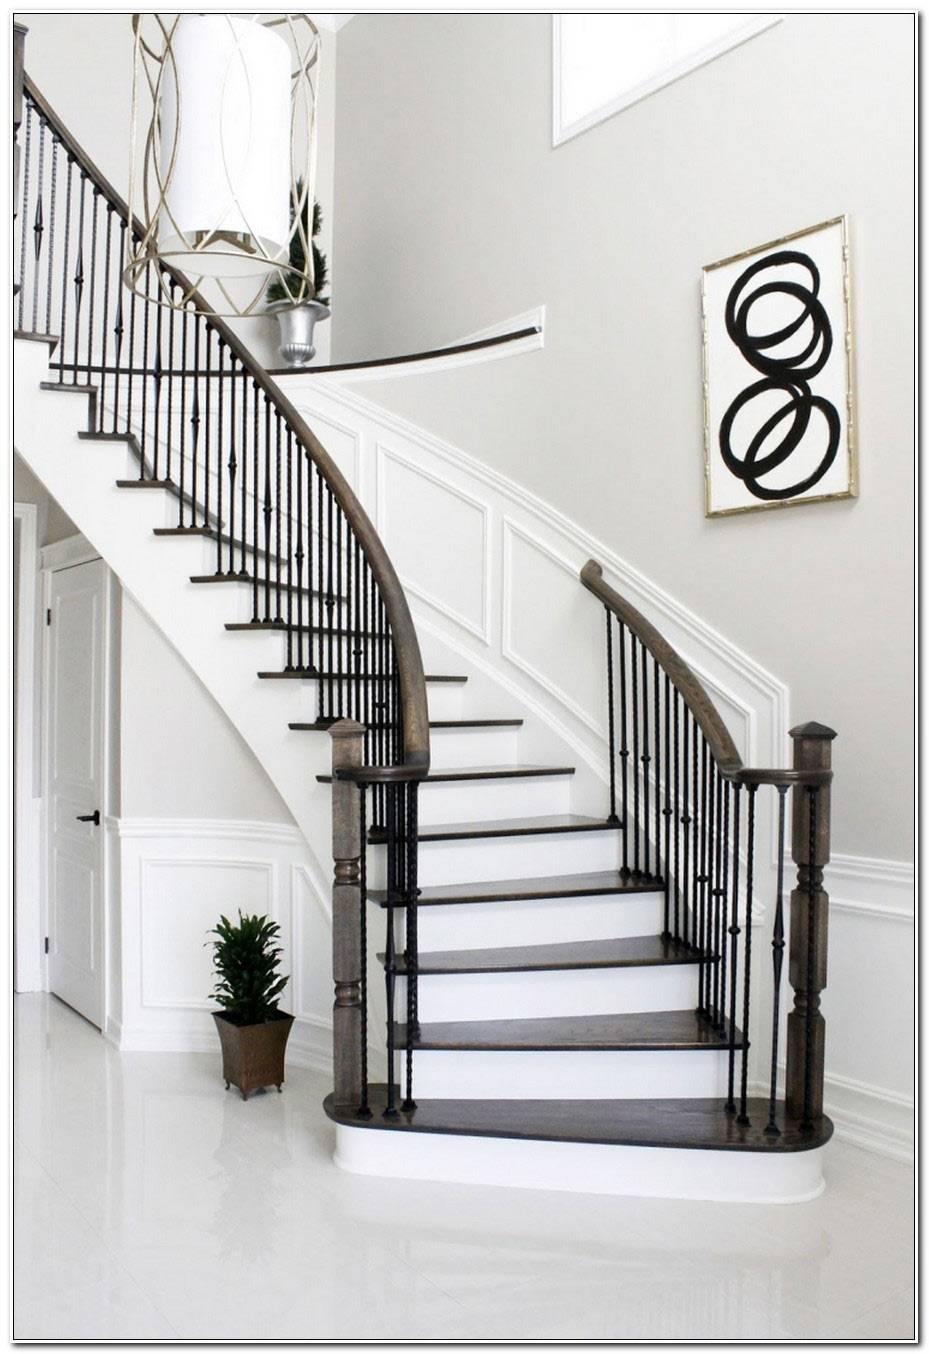 Descente D Escalier Interieur